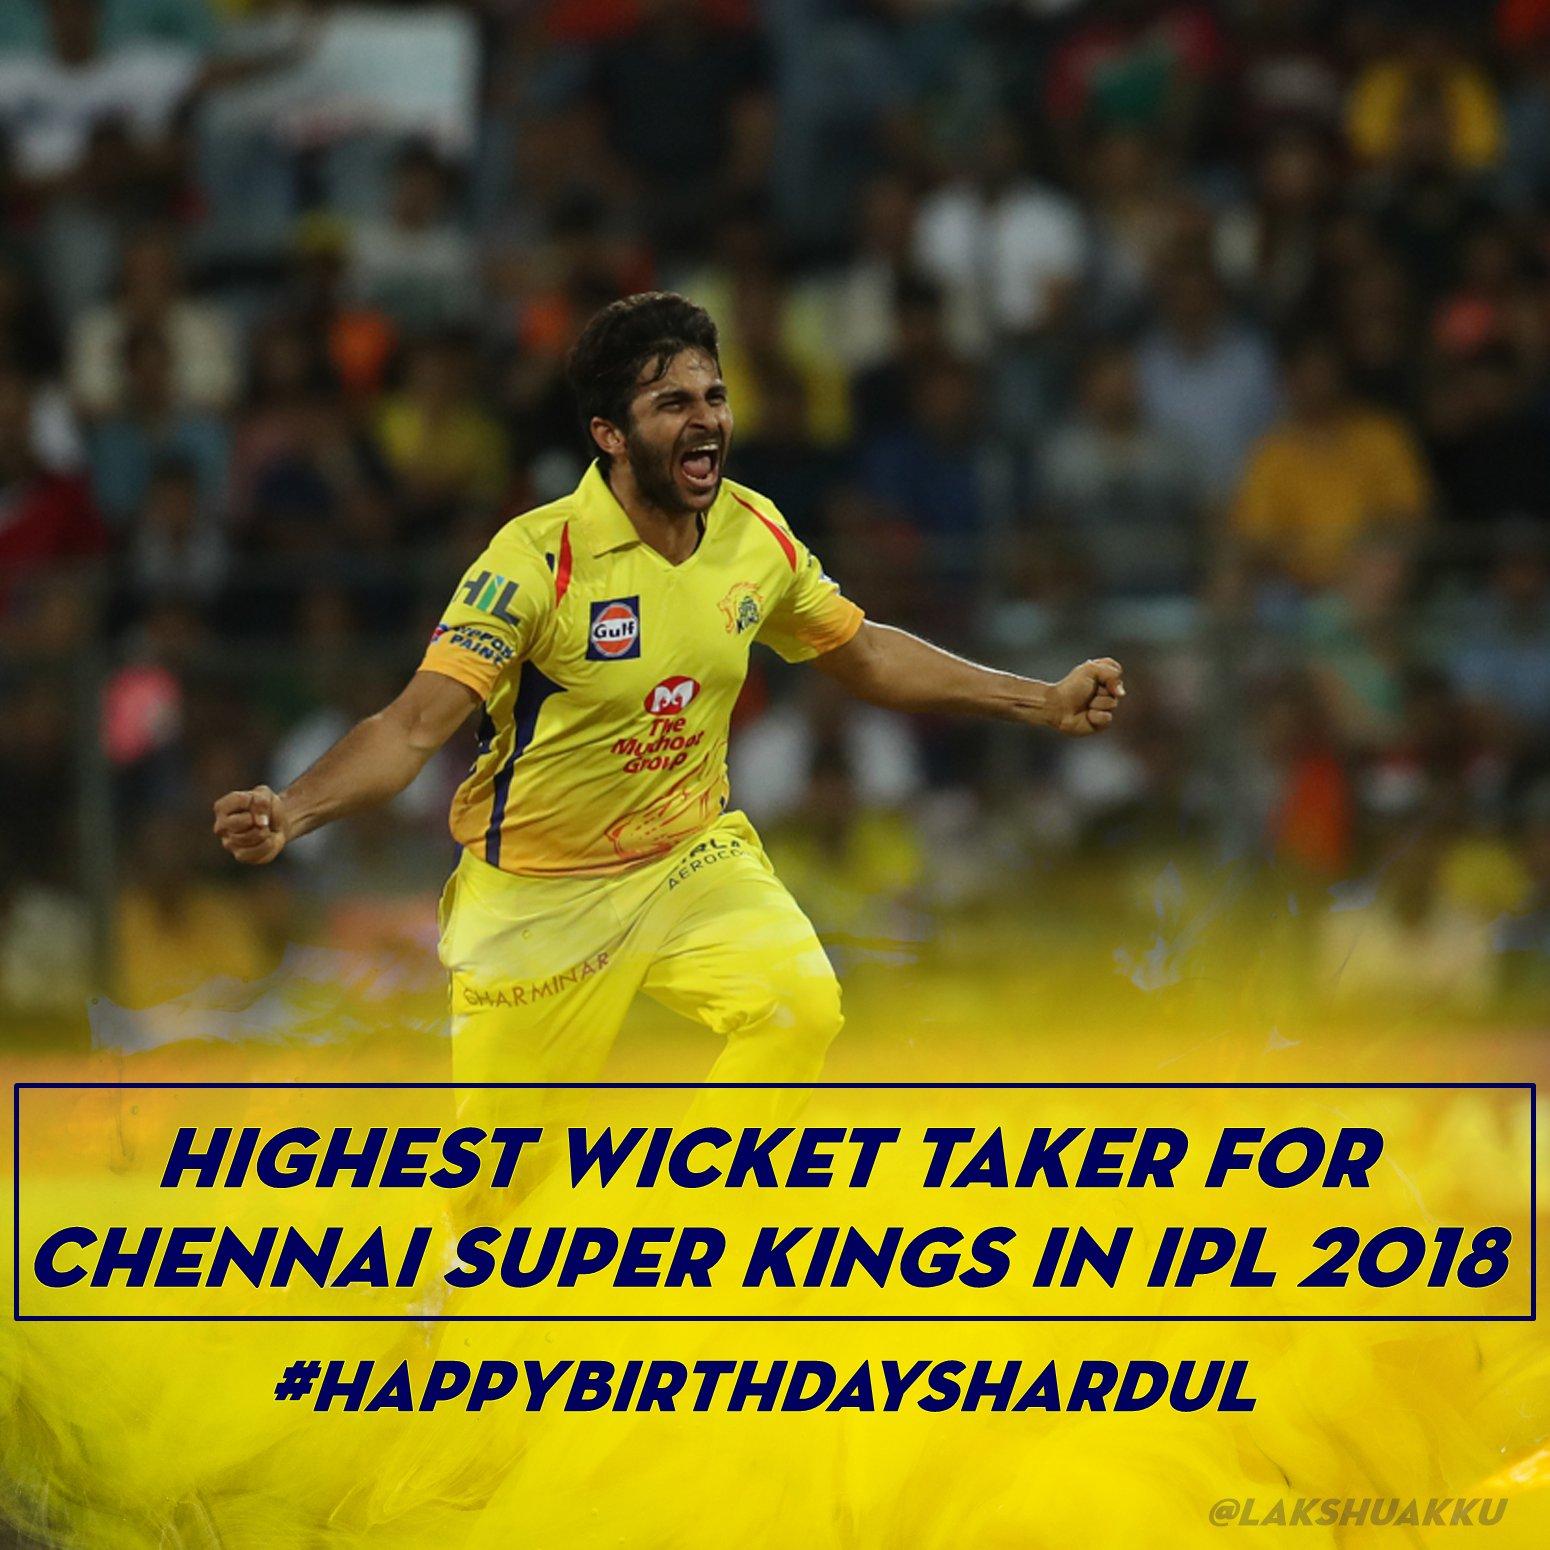 Shardul Thakur Chennai Super Kings Latest Images Tweets Updates